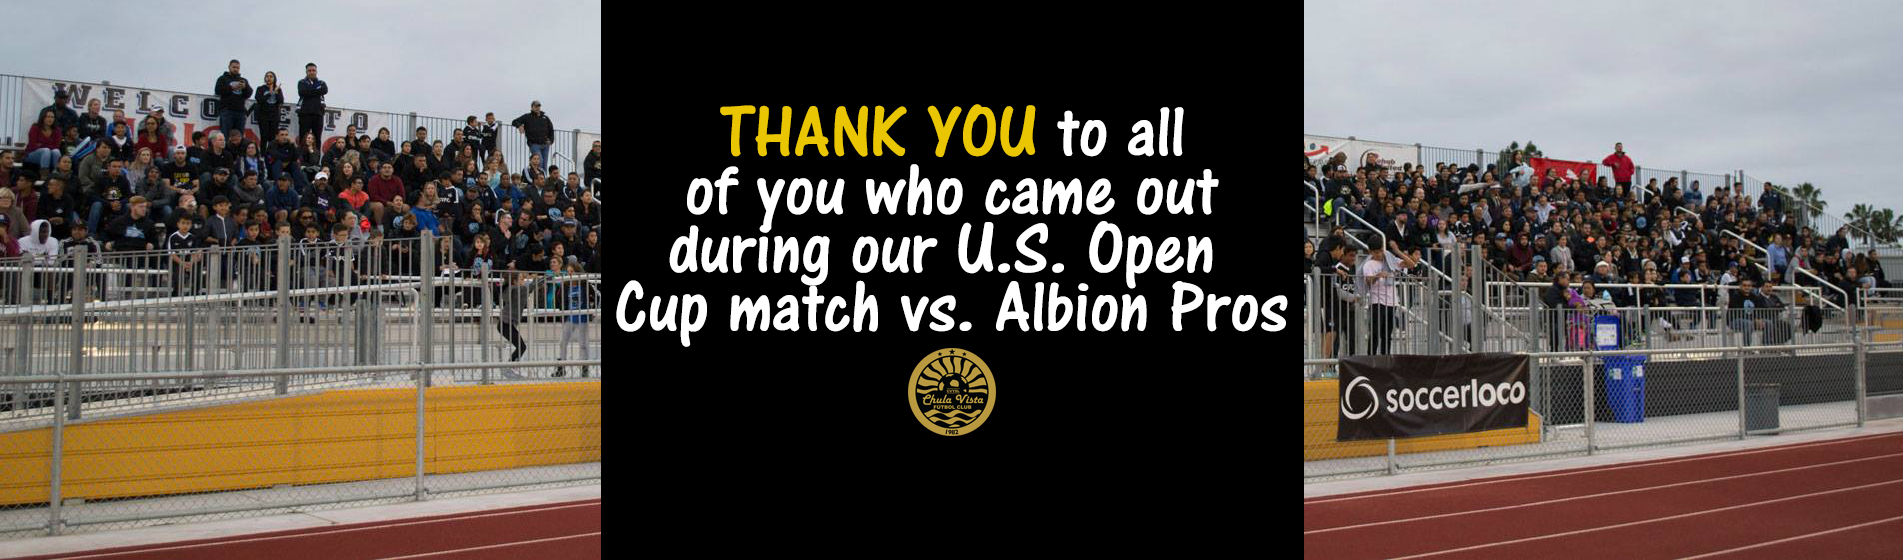 GAME RECAP: Chula Vista FC @ Albion Pros